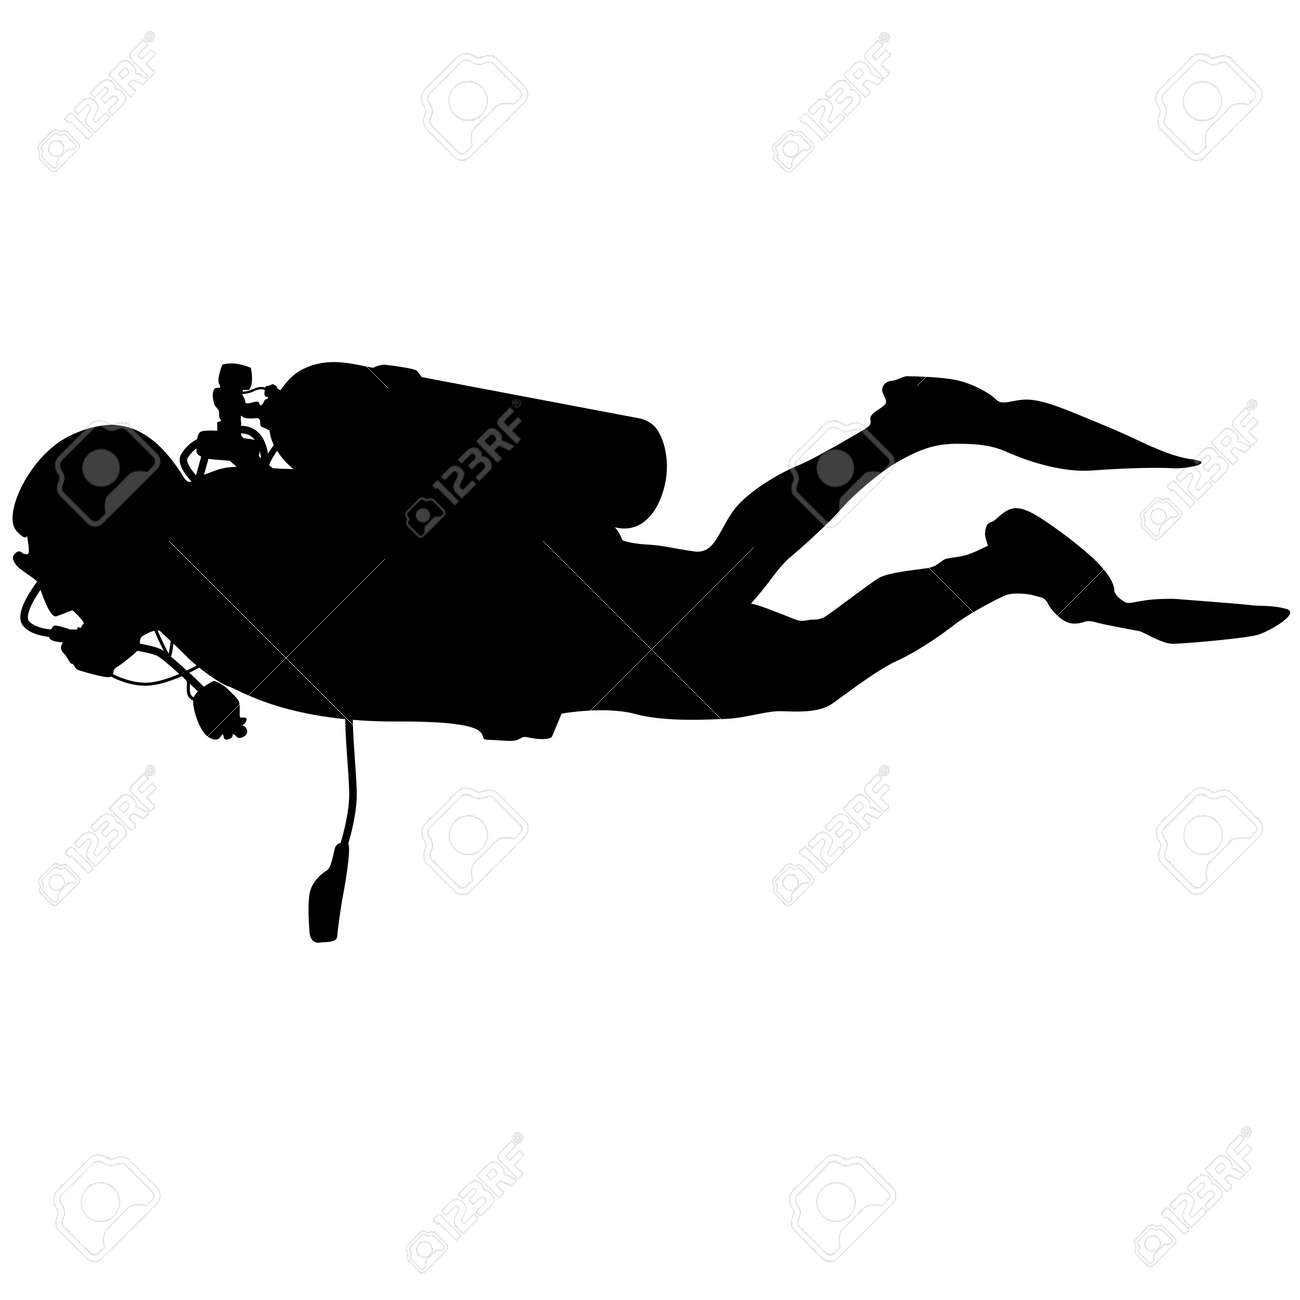 Black silhouette scuba divers. Vector illustration. - 41635842